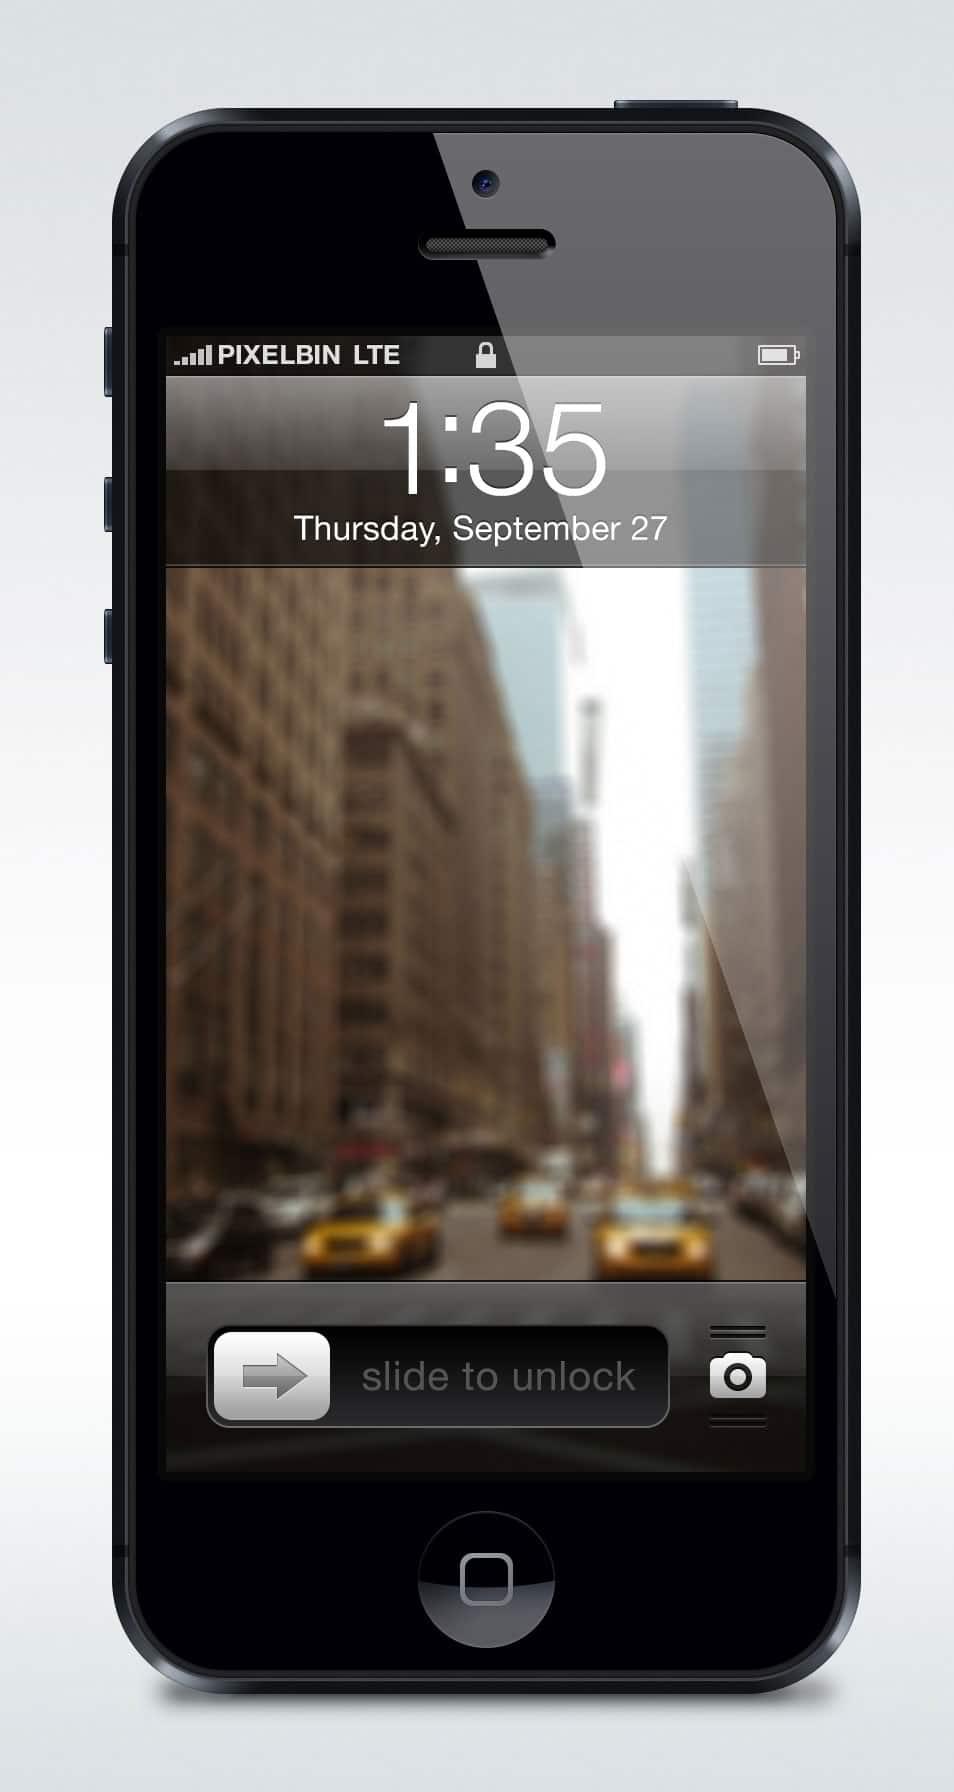 Apple iPhone 5 Vectorized Mockup